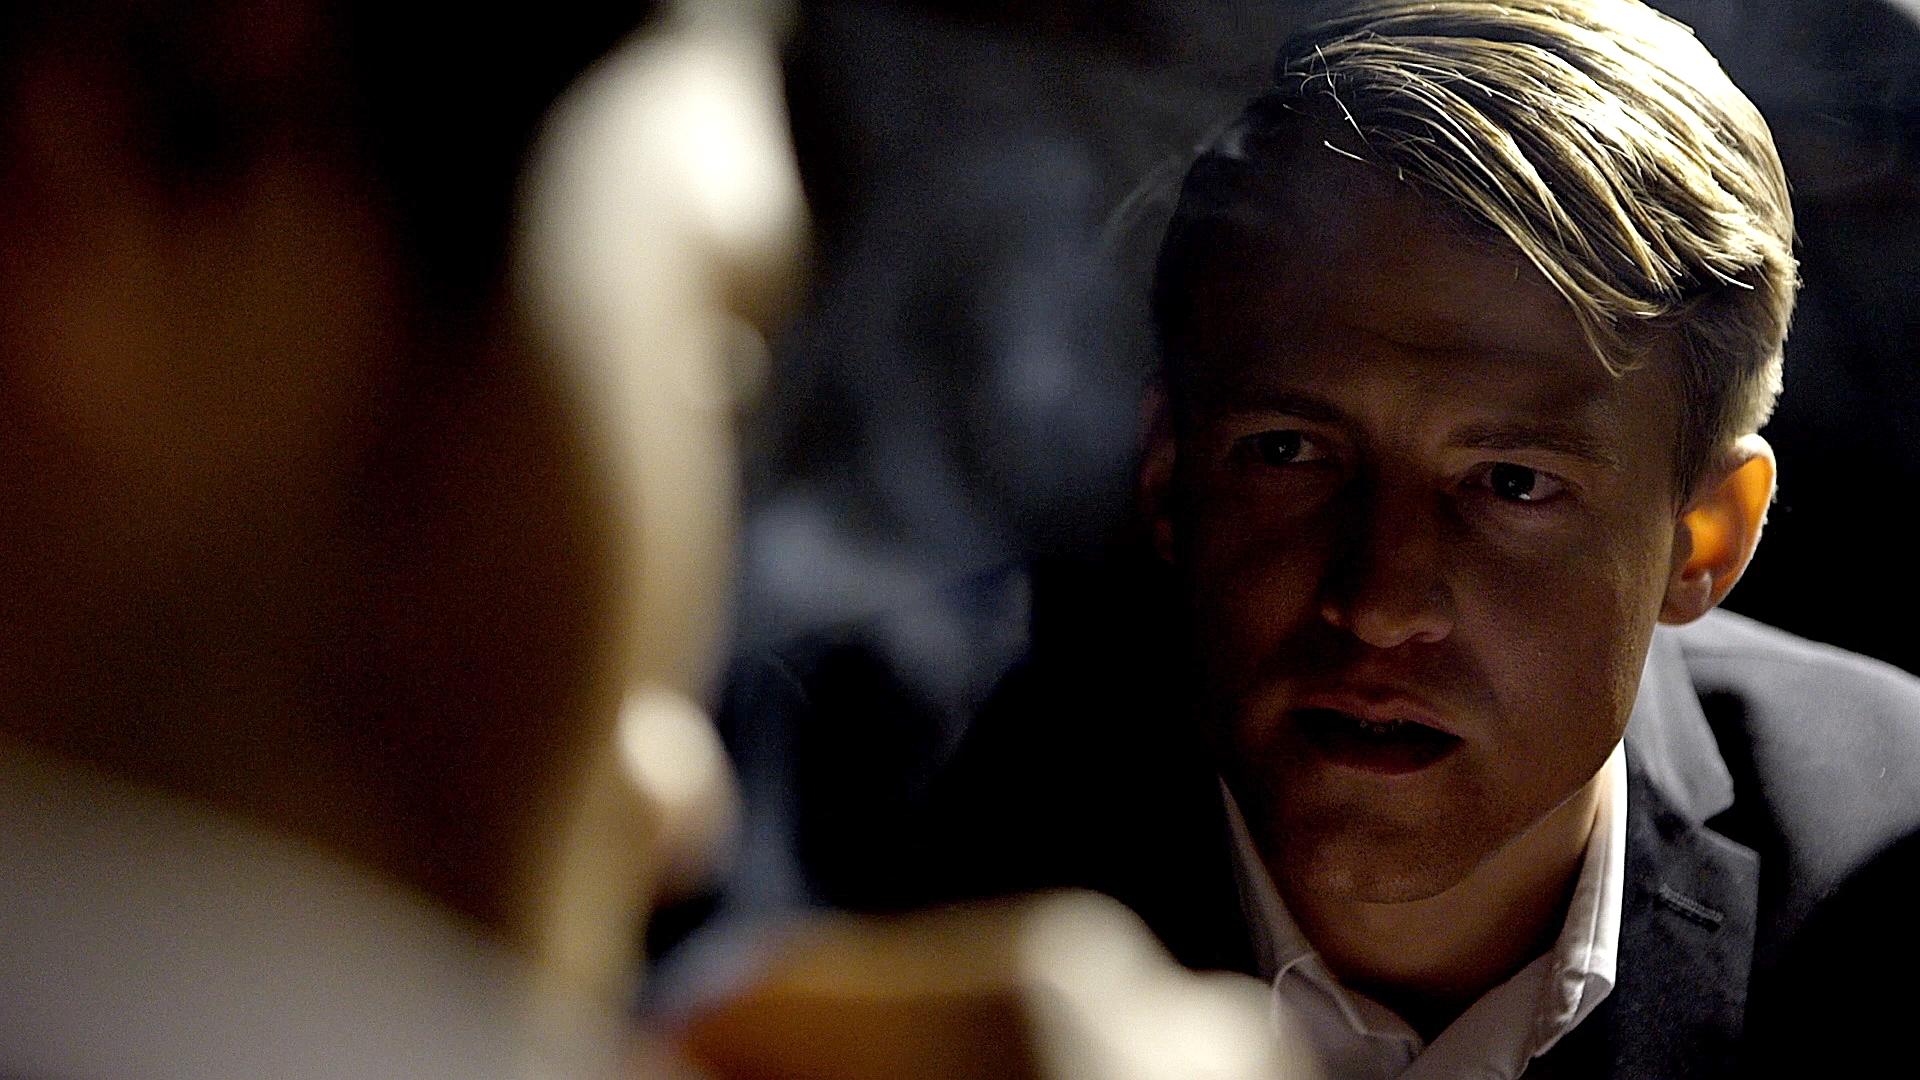 Nick Moss as INTERROGATOR in The Interrogation (Film)